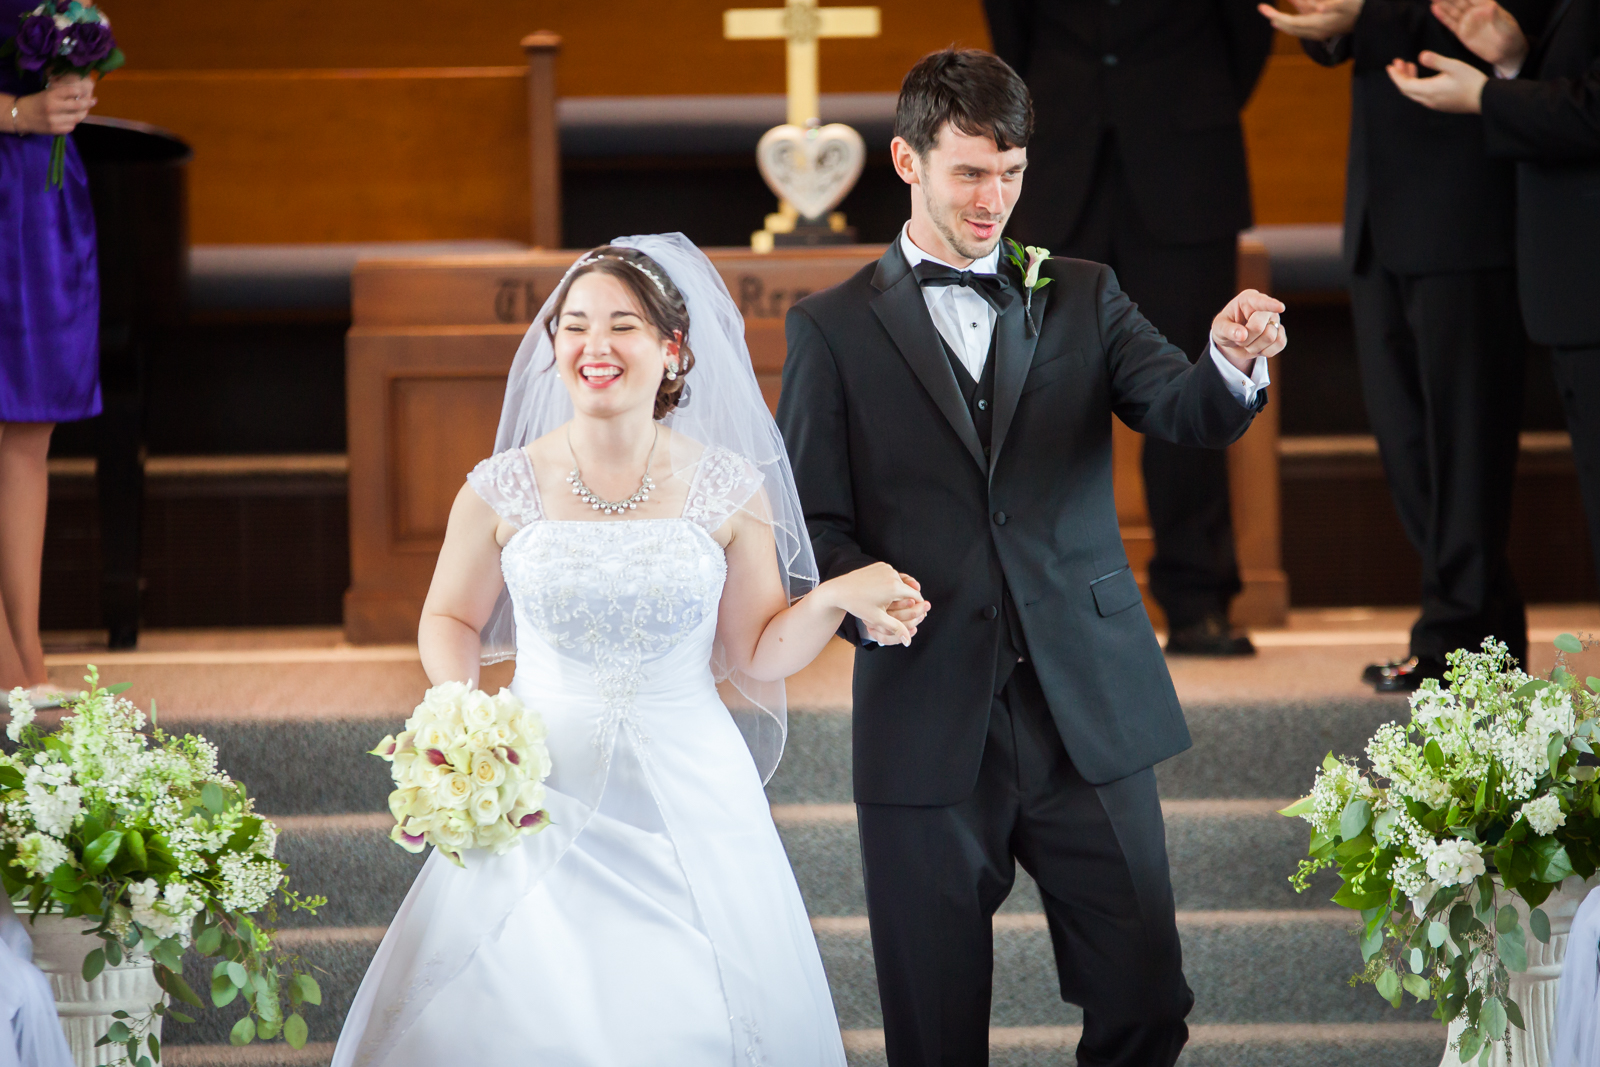 naperville-wedding-photography-55.jpg